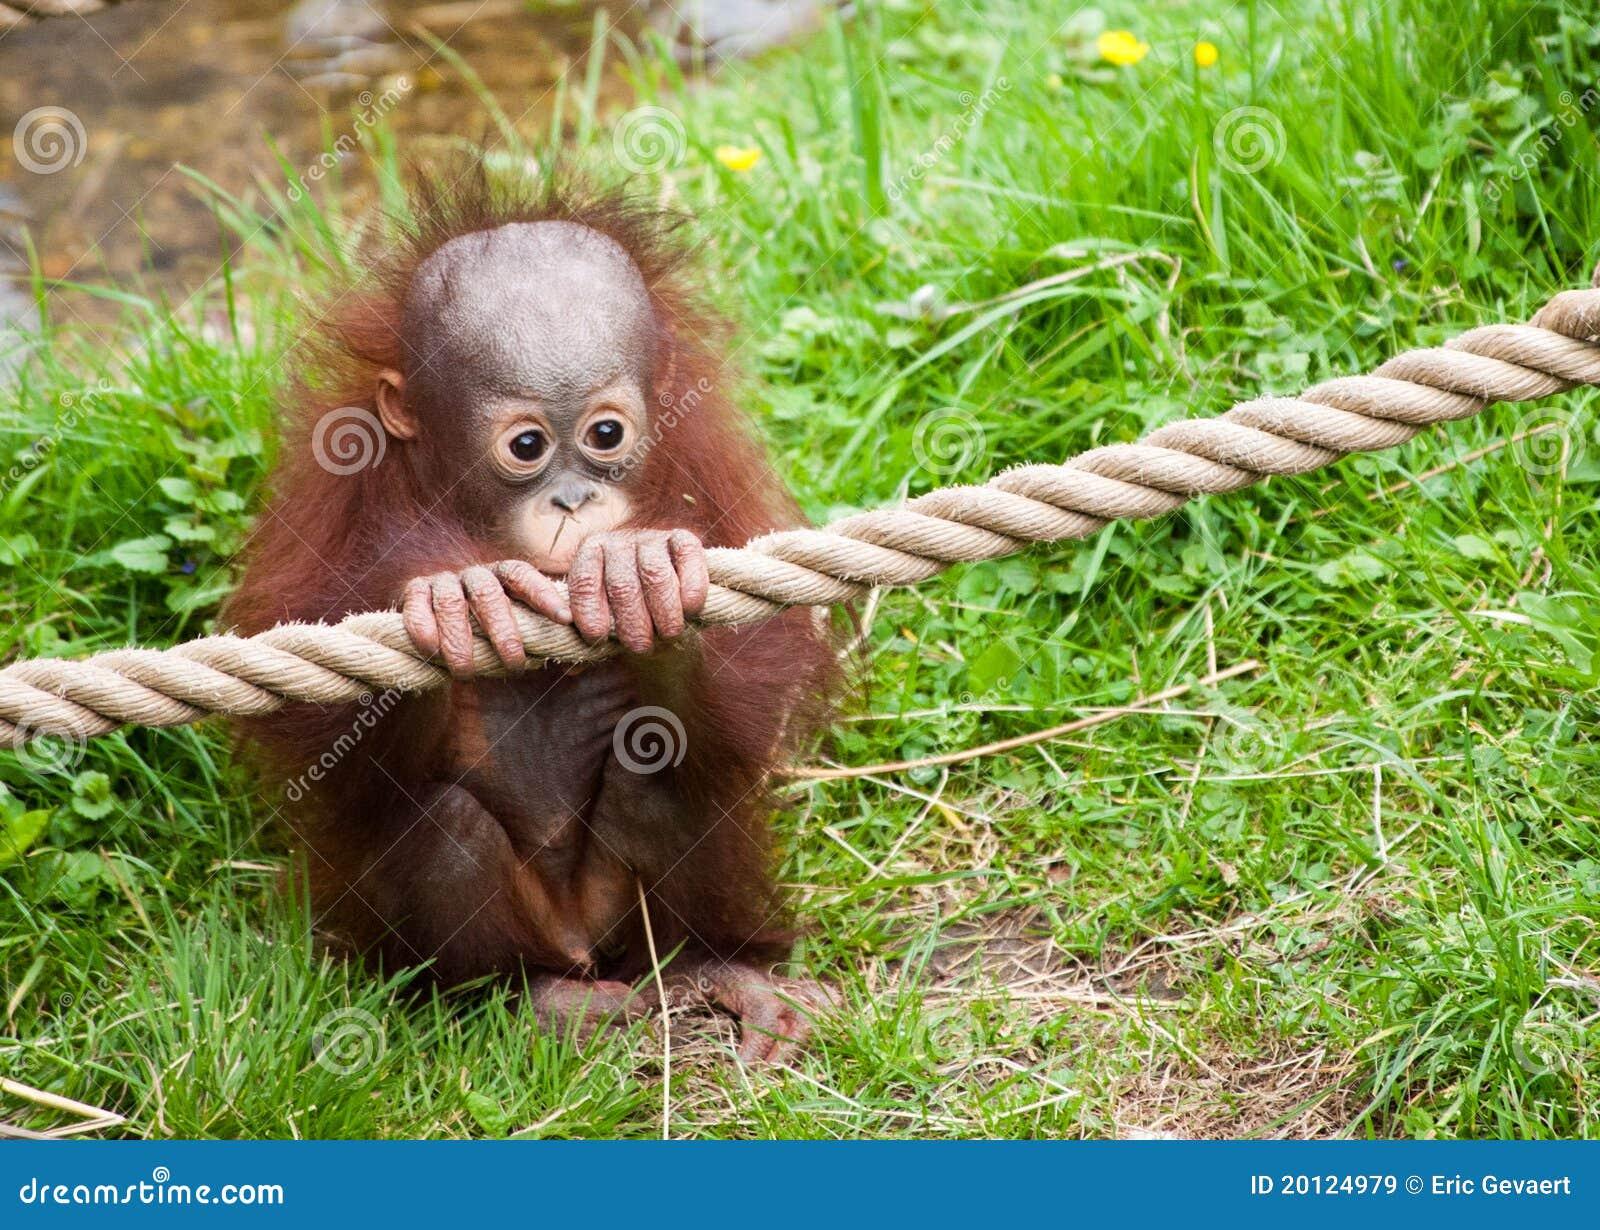 cute baby orangutan 20124979